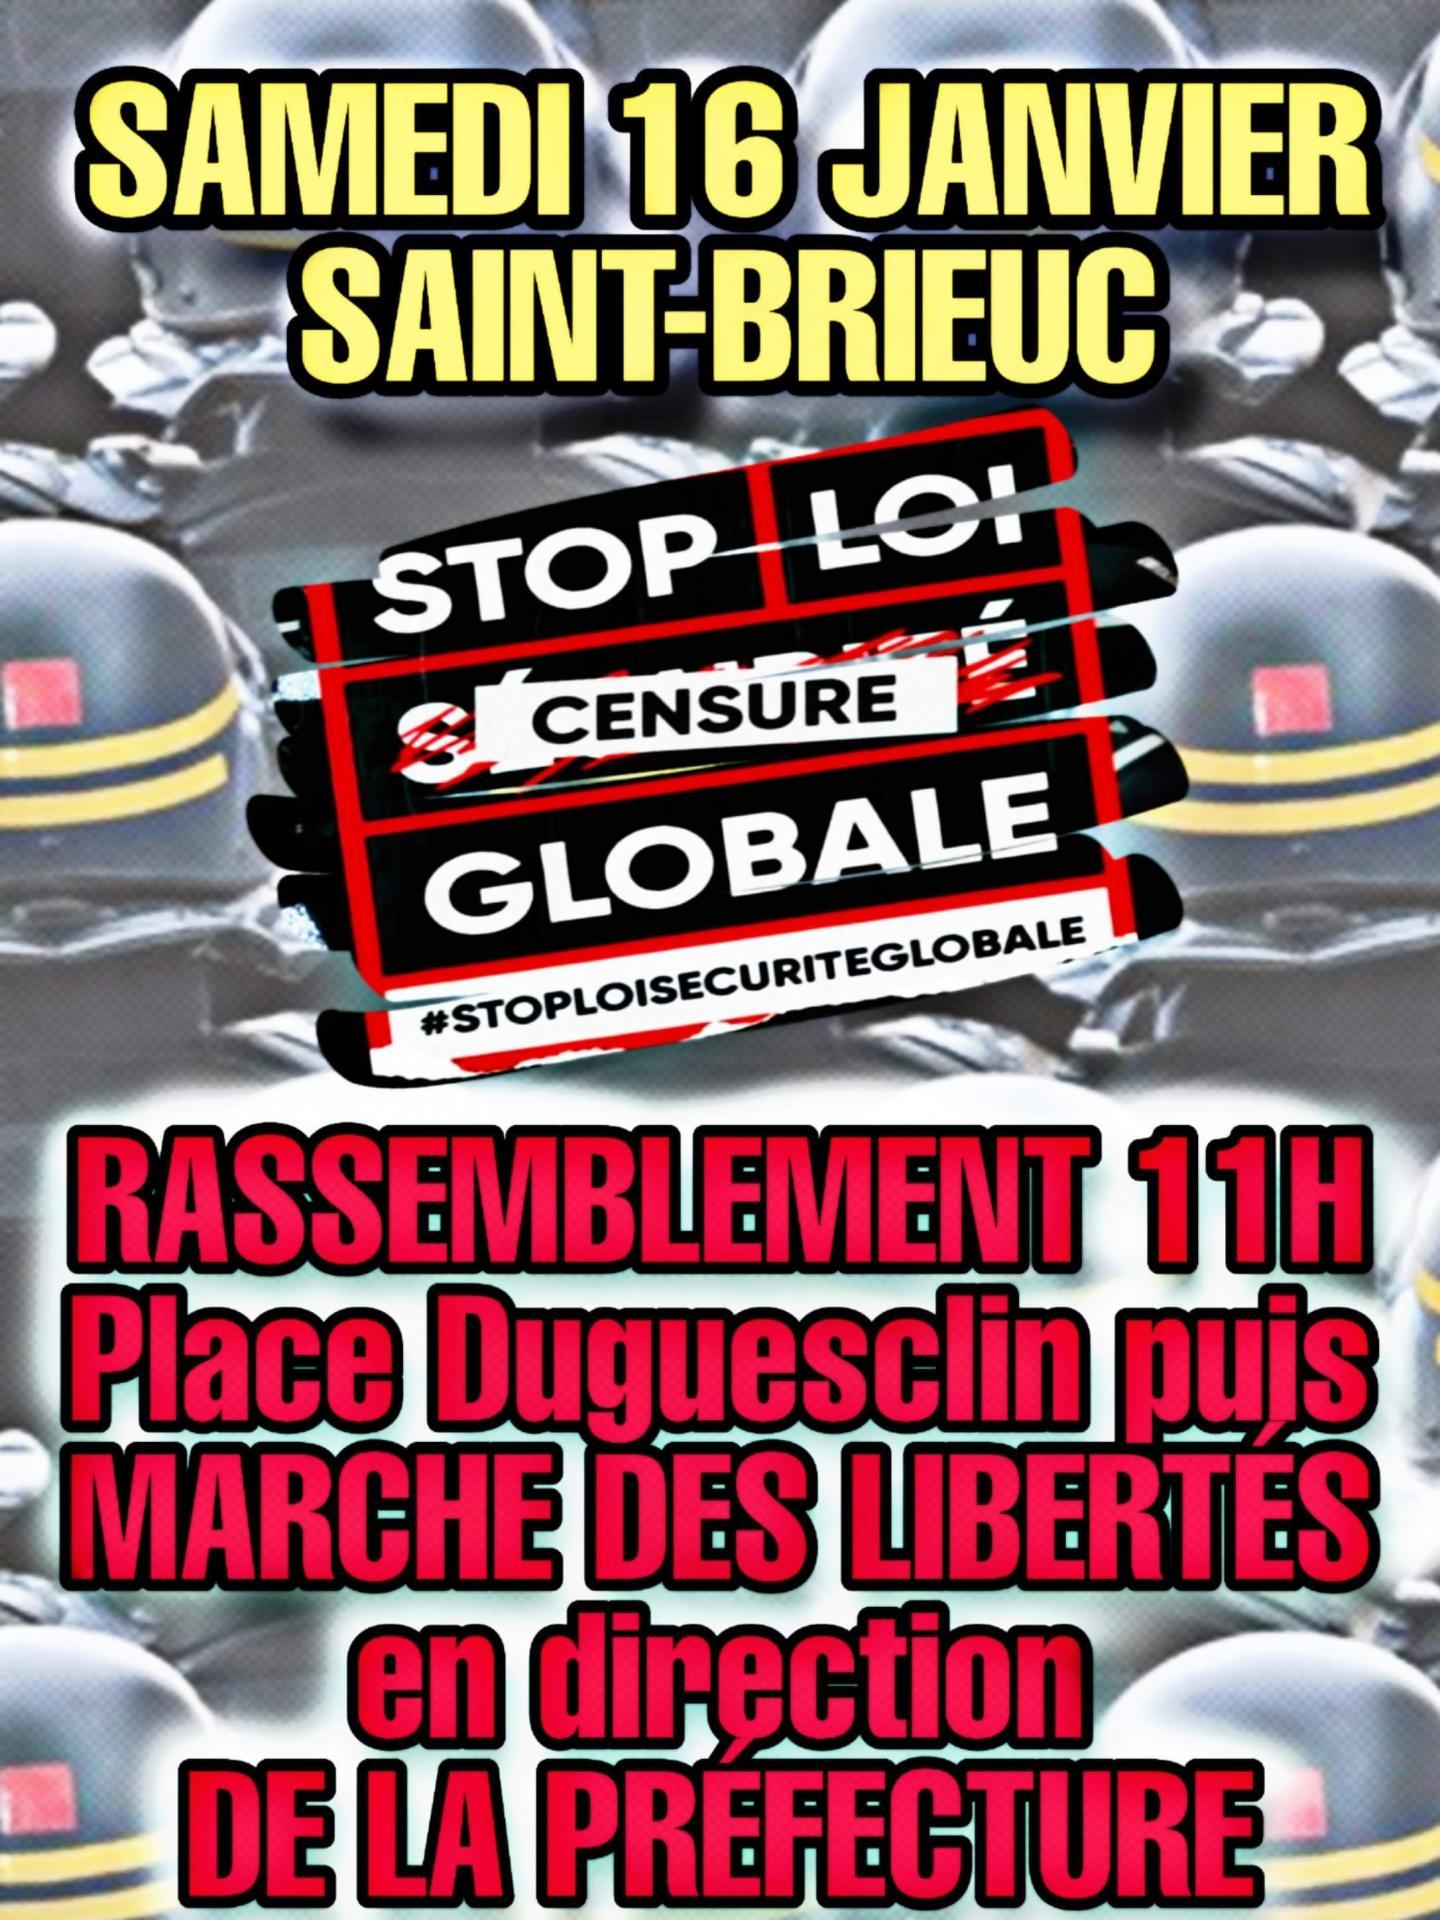 Samedi 16 janvier stop loi secu globale